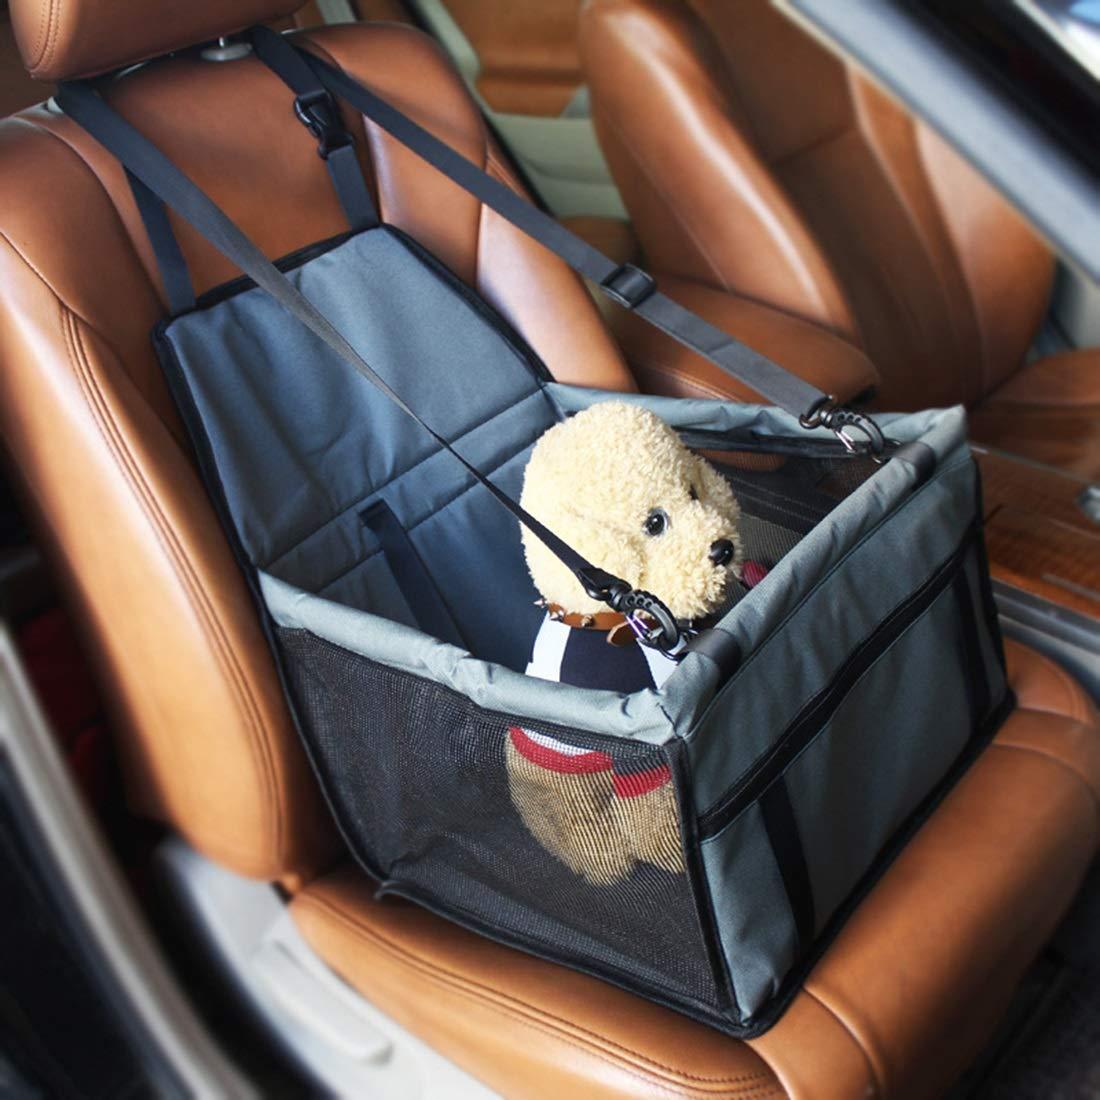 bluee Fiber bluee Fiber KERVINJESSIE Pet Car Bag Dog Car Bag Anti-Collapse Mesh Car Kit Dog Car Seat Pet Car Mat Bag Car Dog Pad Waterproof Pet Travel (color   bluee, Size   Fiber)